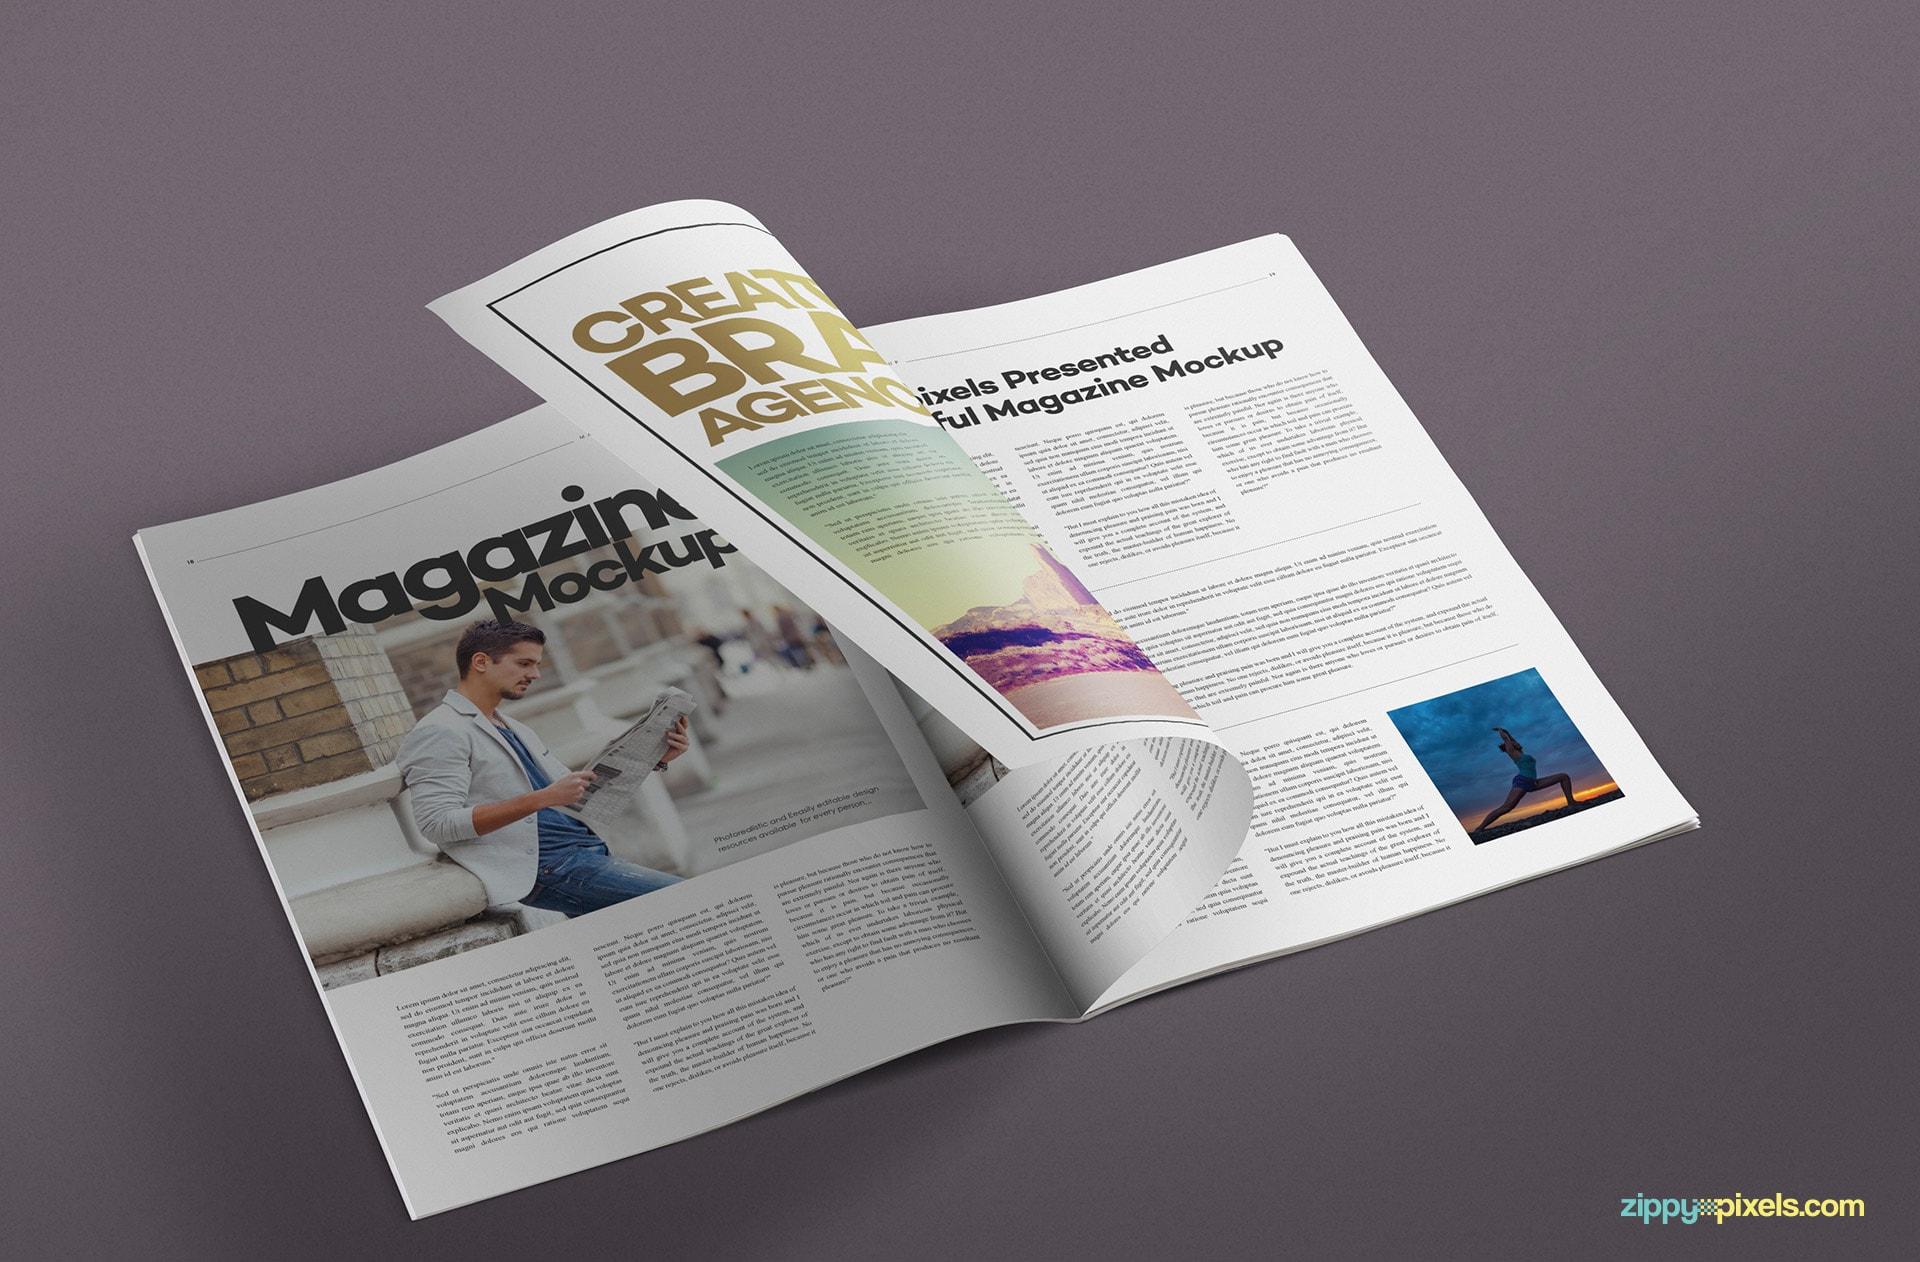 high quality mag mock-ups for inspiring design presentations